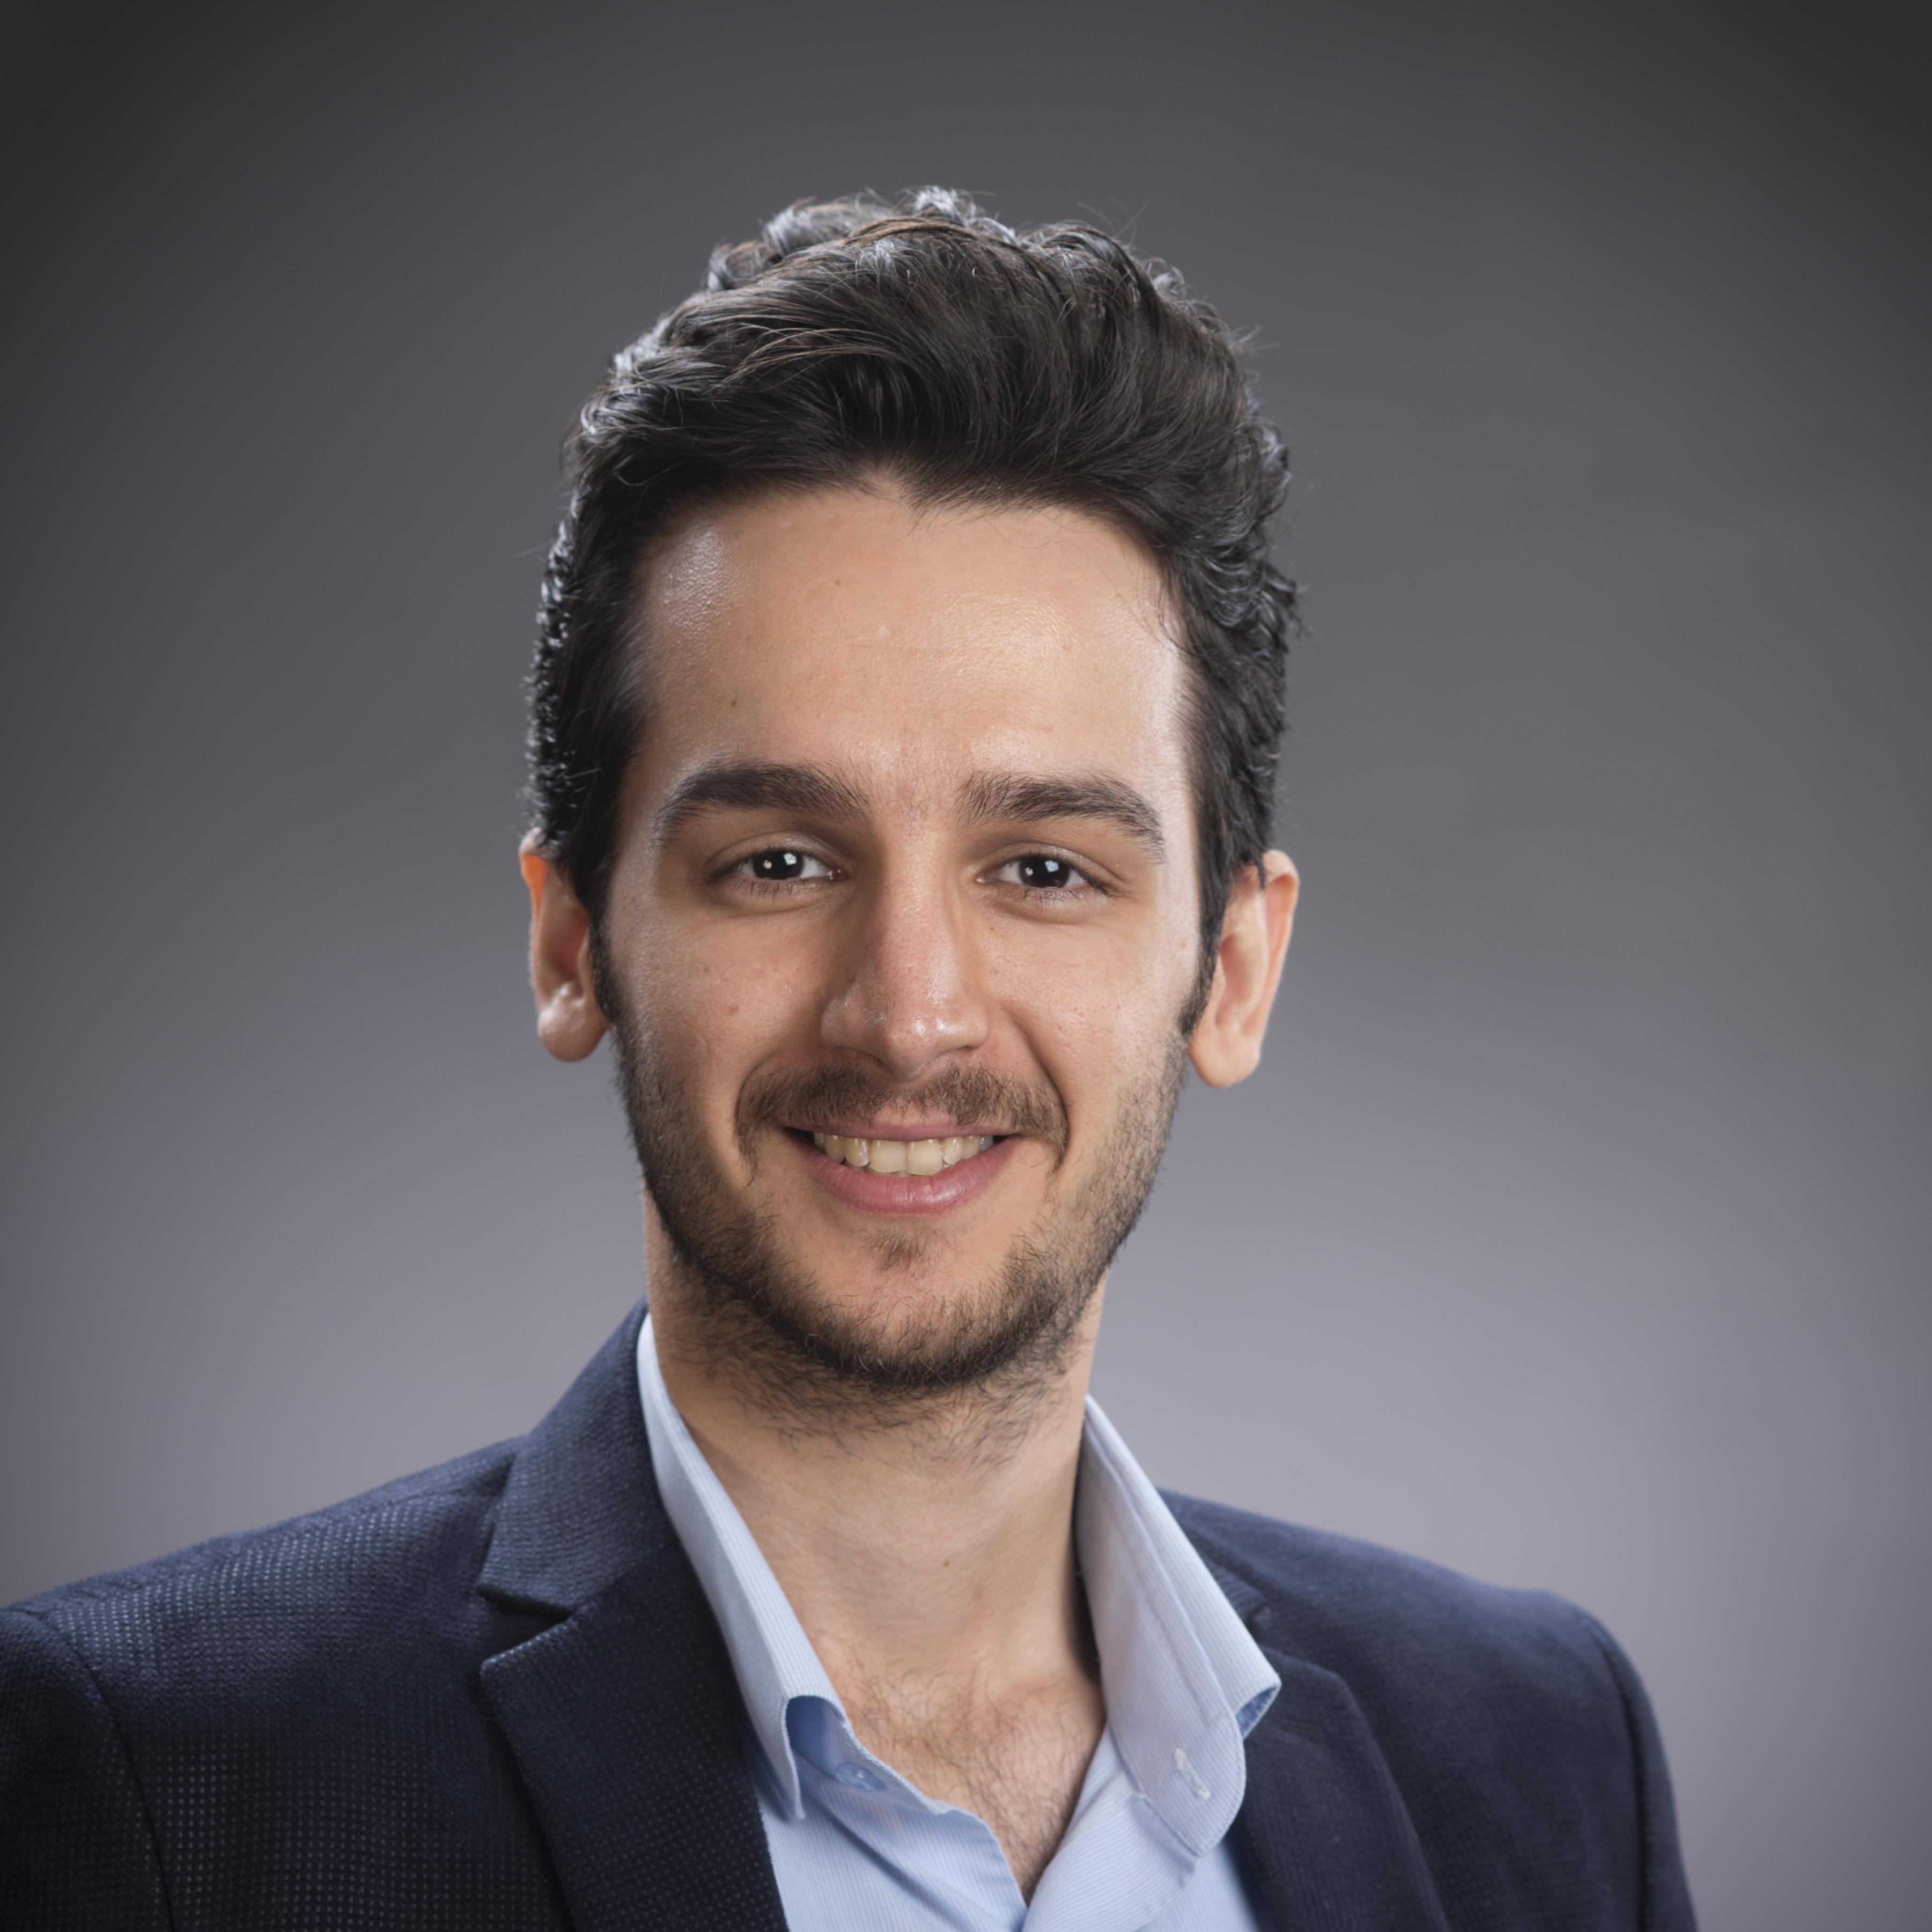 Soheil Mohseni profile picture